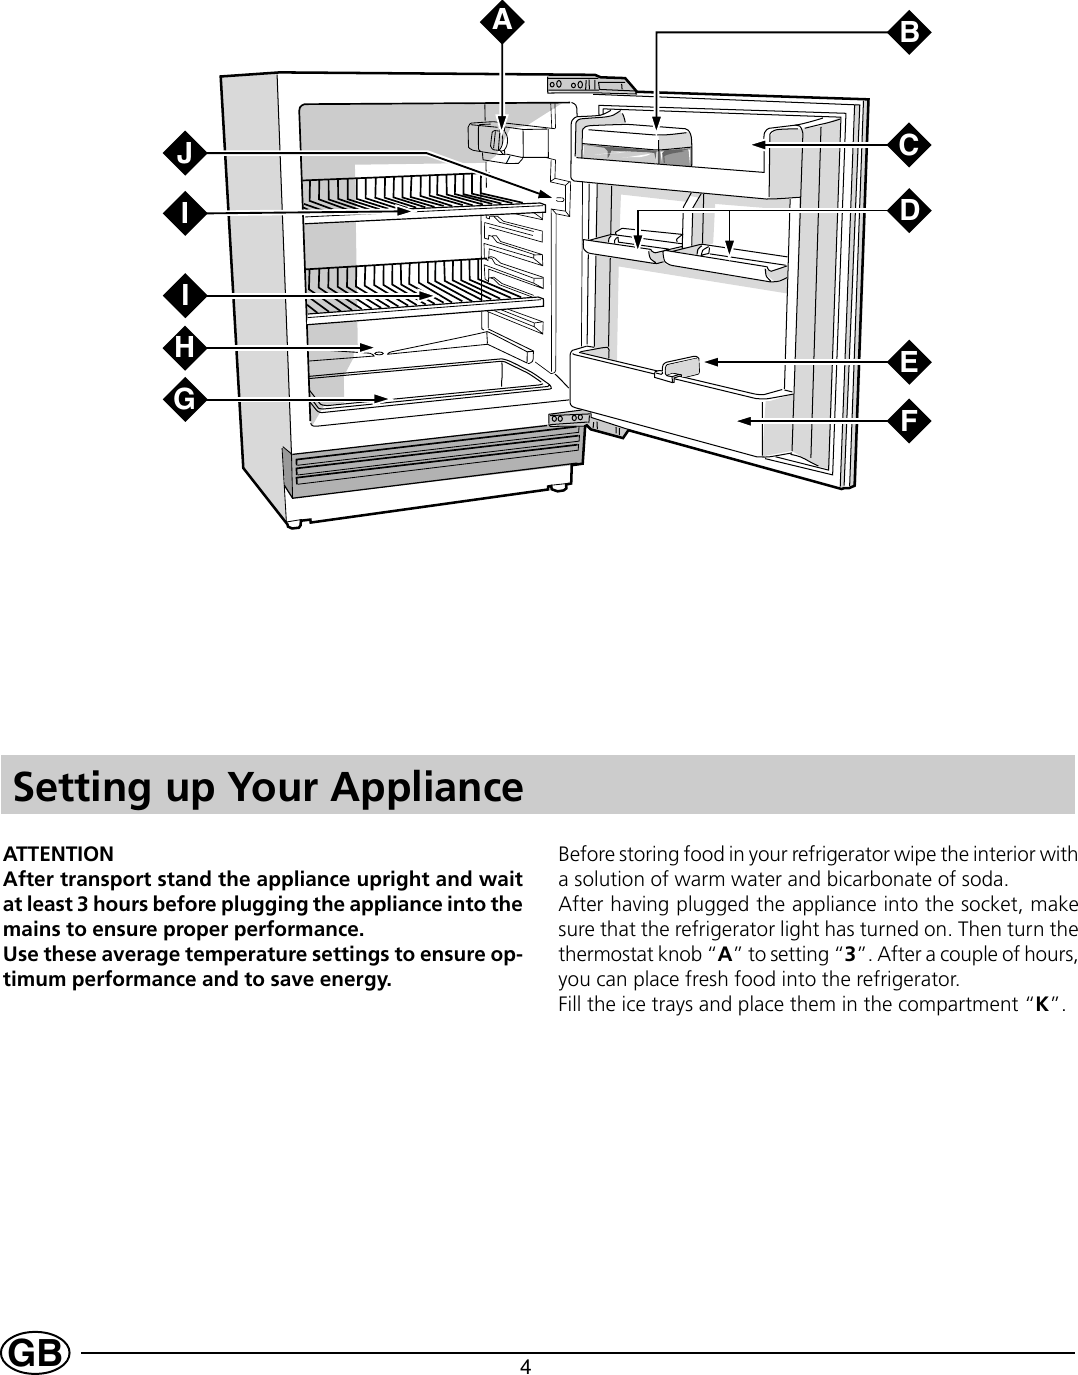 Page 6 of 12 - Indesit Indesit-Refrigerator-Gse-160-Uk-